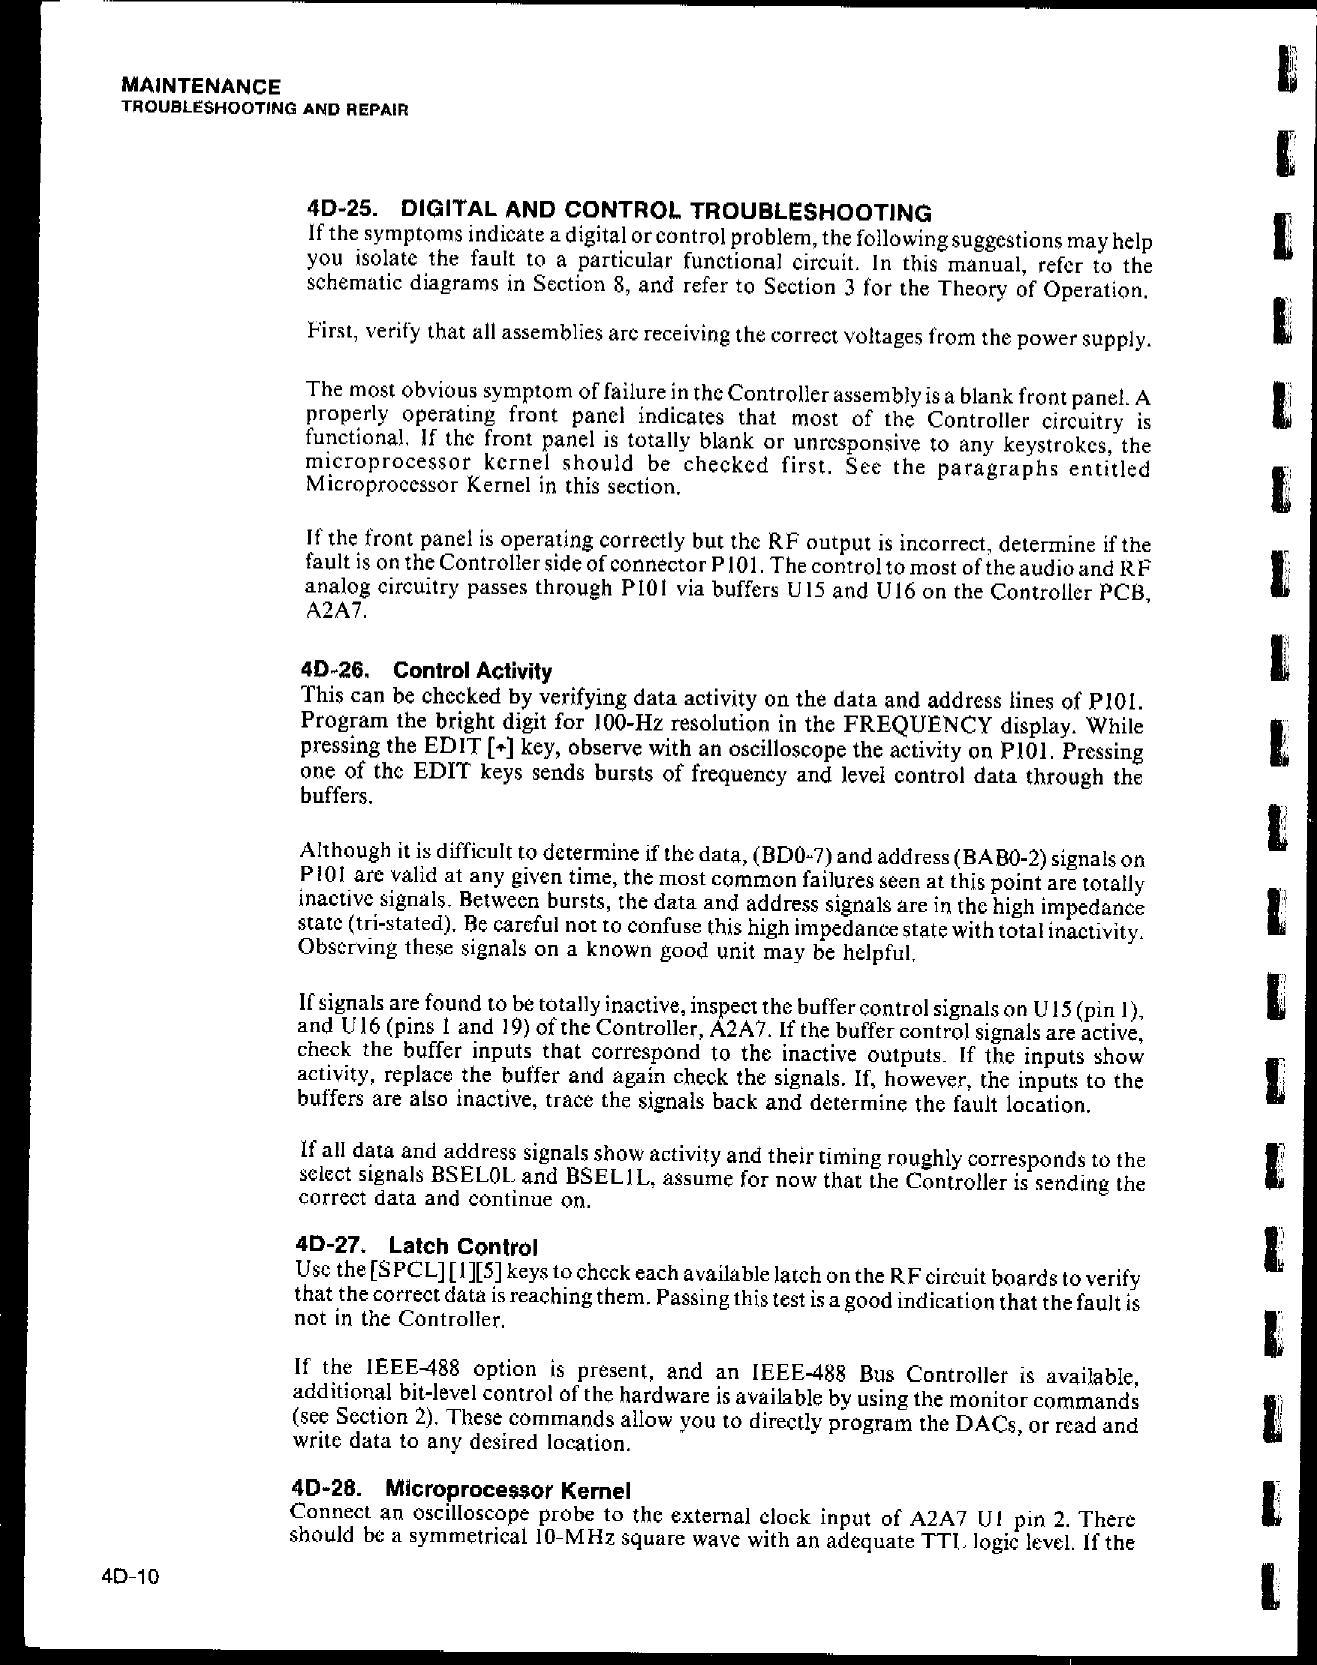 Fluke Stereo System 6060B Users Manual